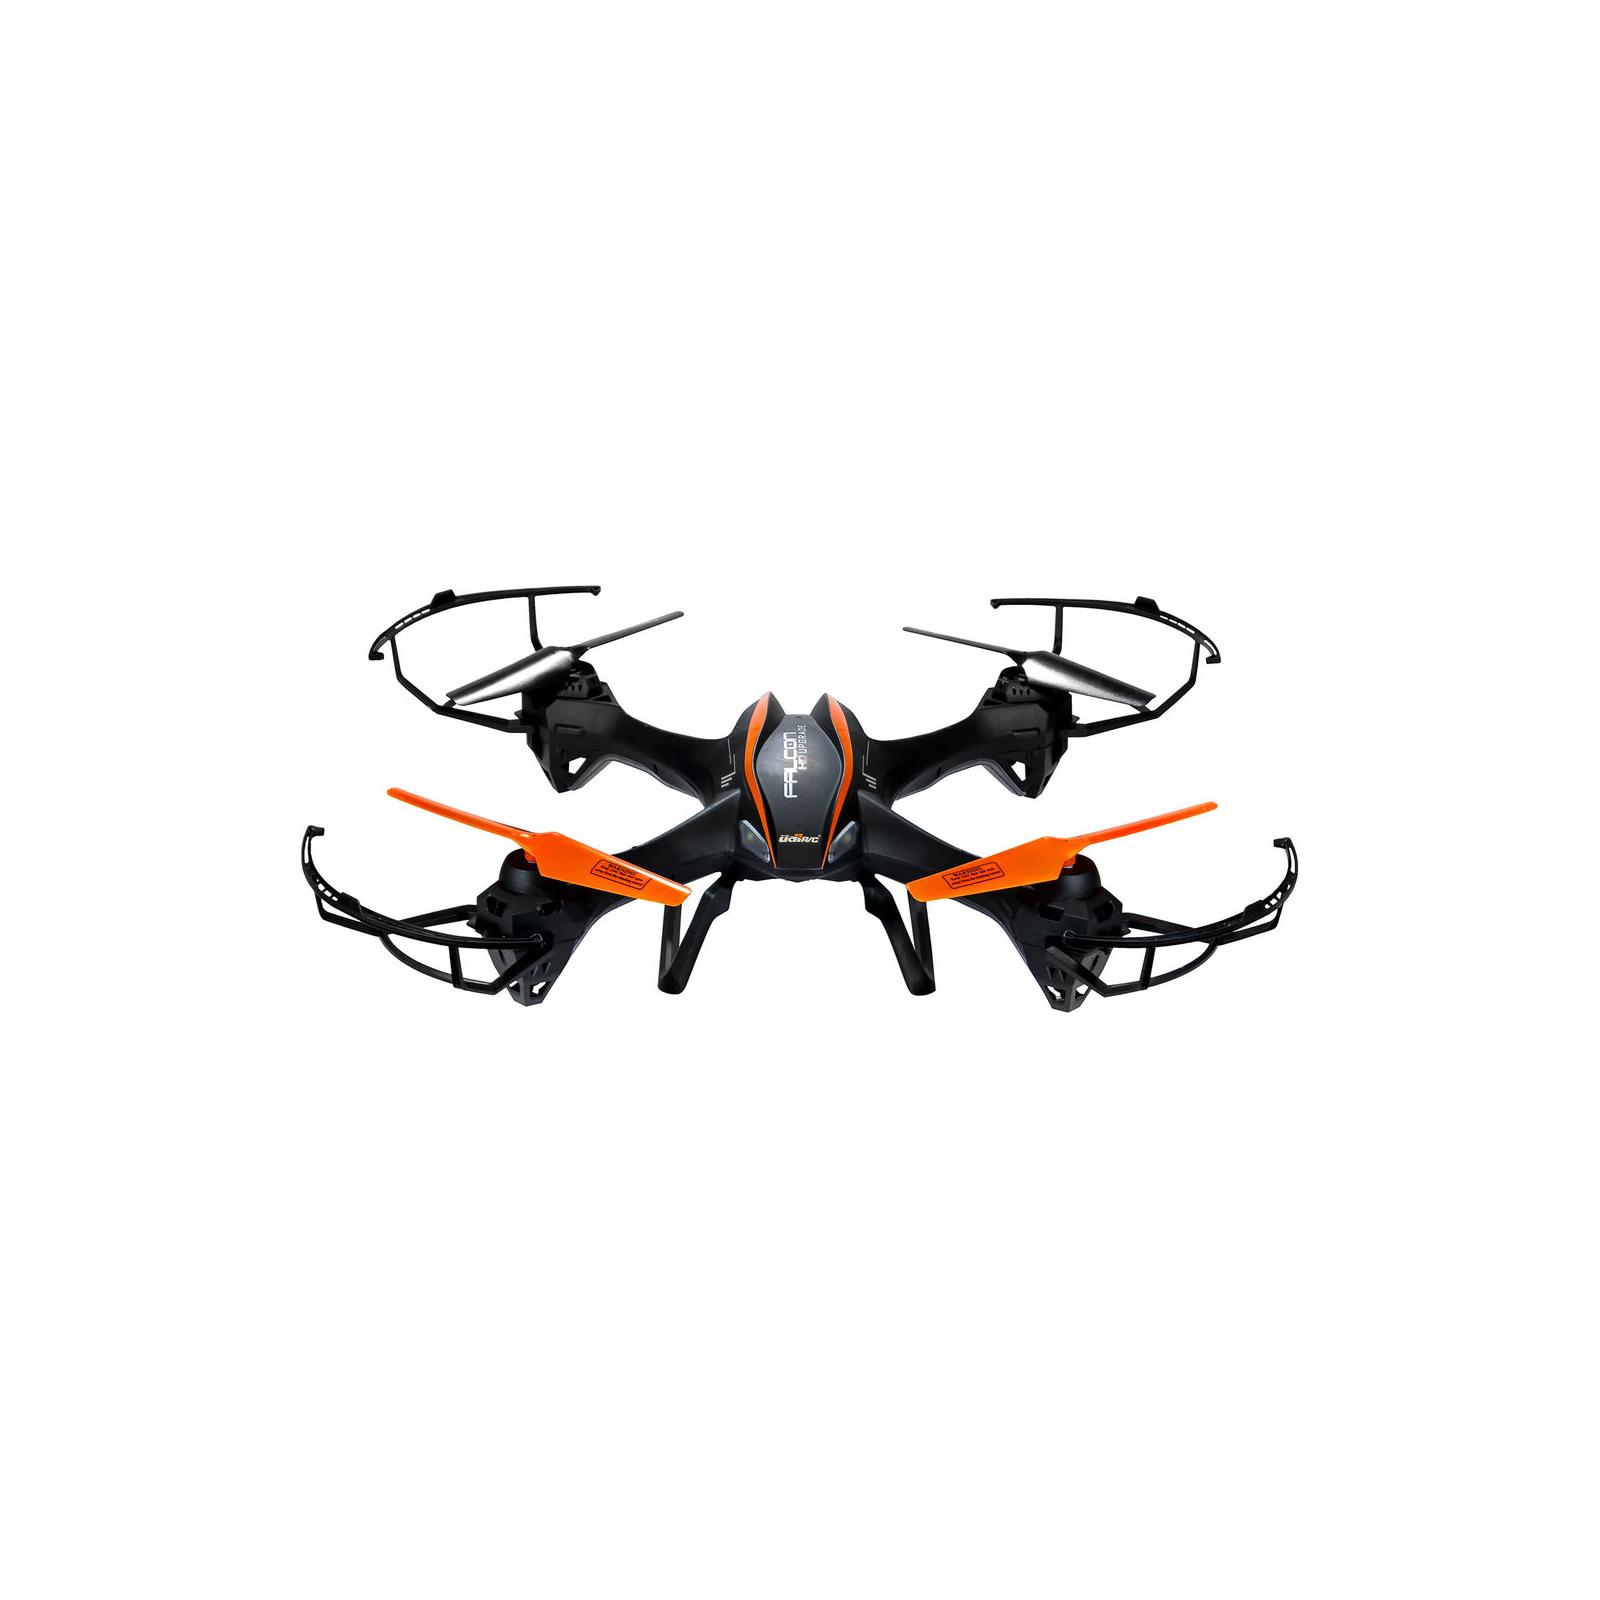 Квадрокоптер UDIRC U842 FALCON 2,4 GHz 486 мм HD бортовая камера 4CH (U842 Black)